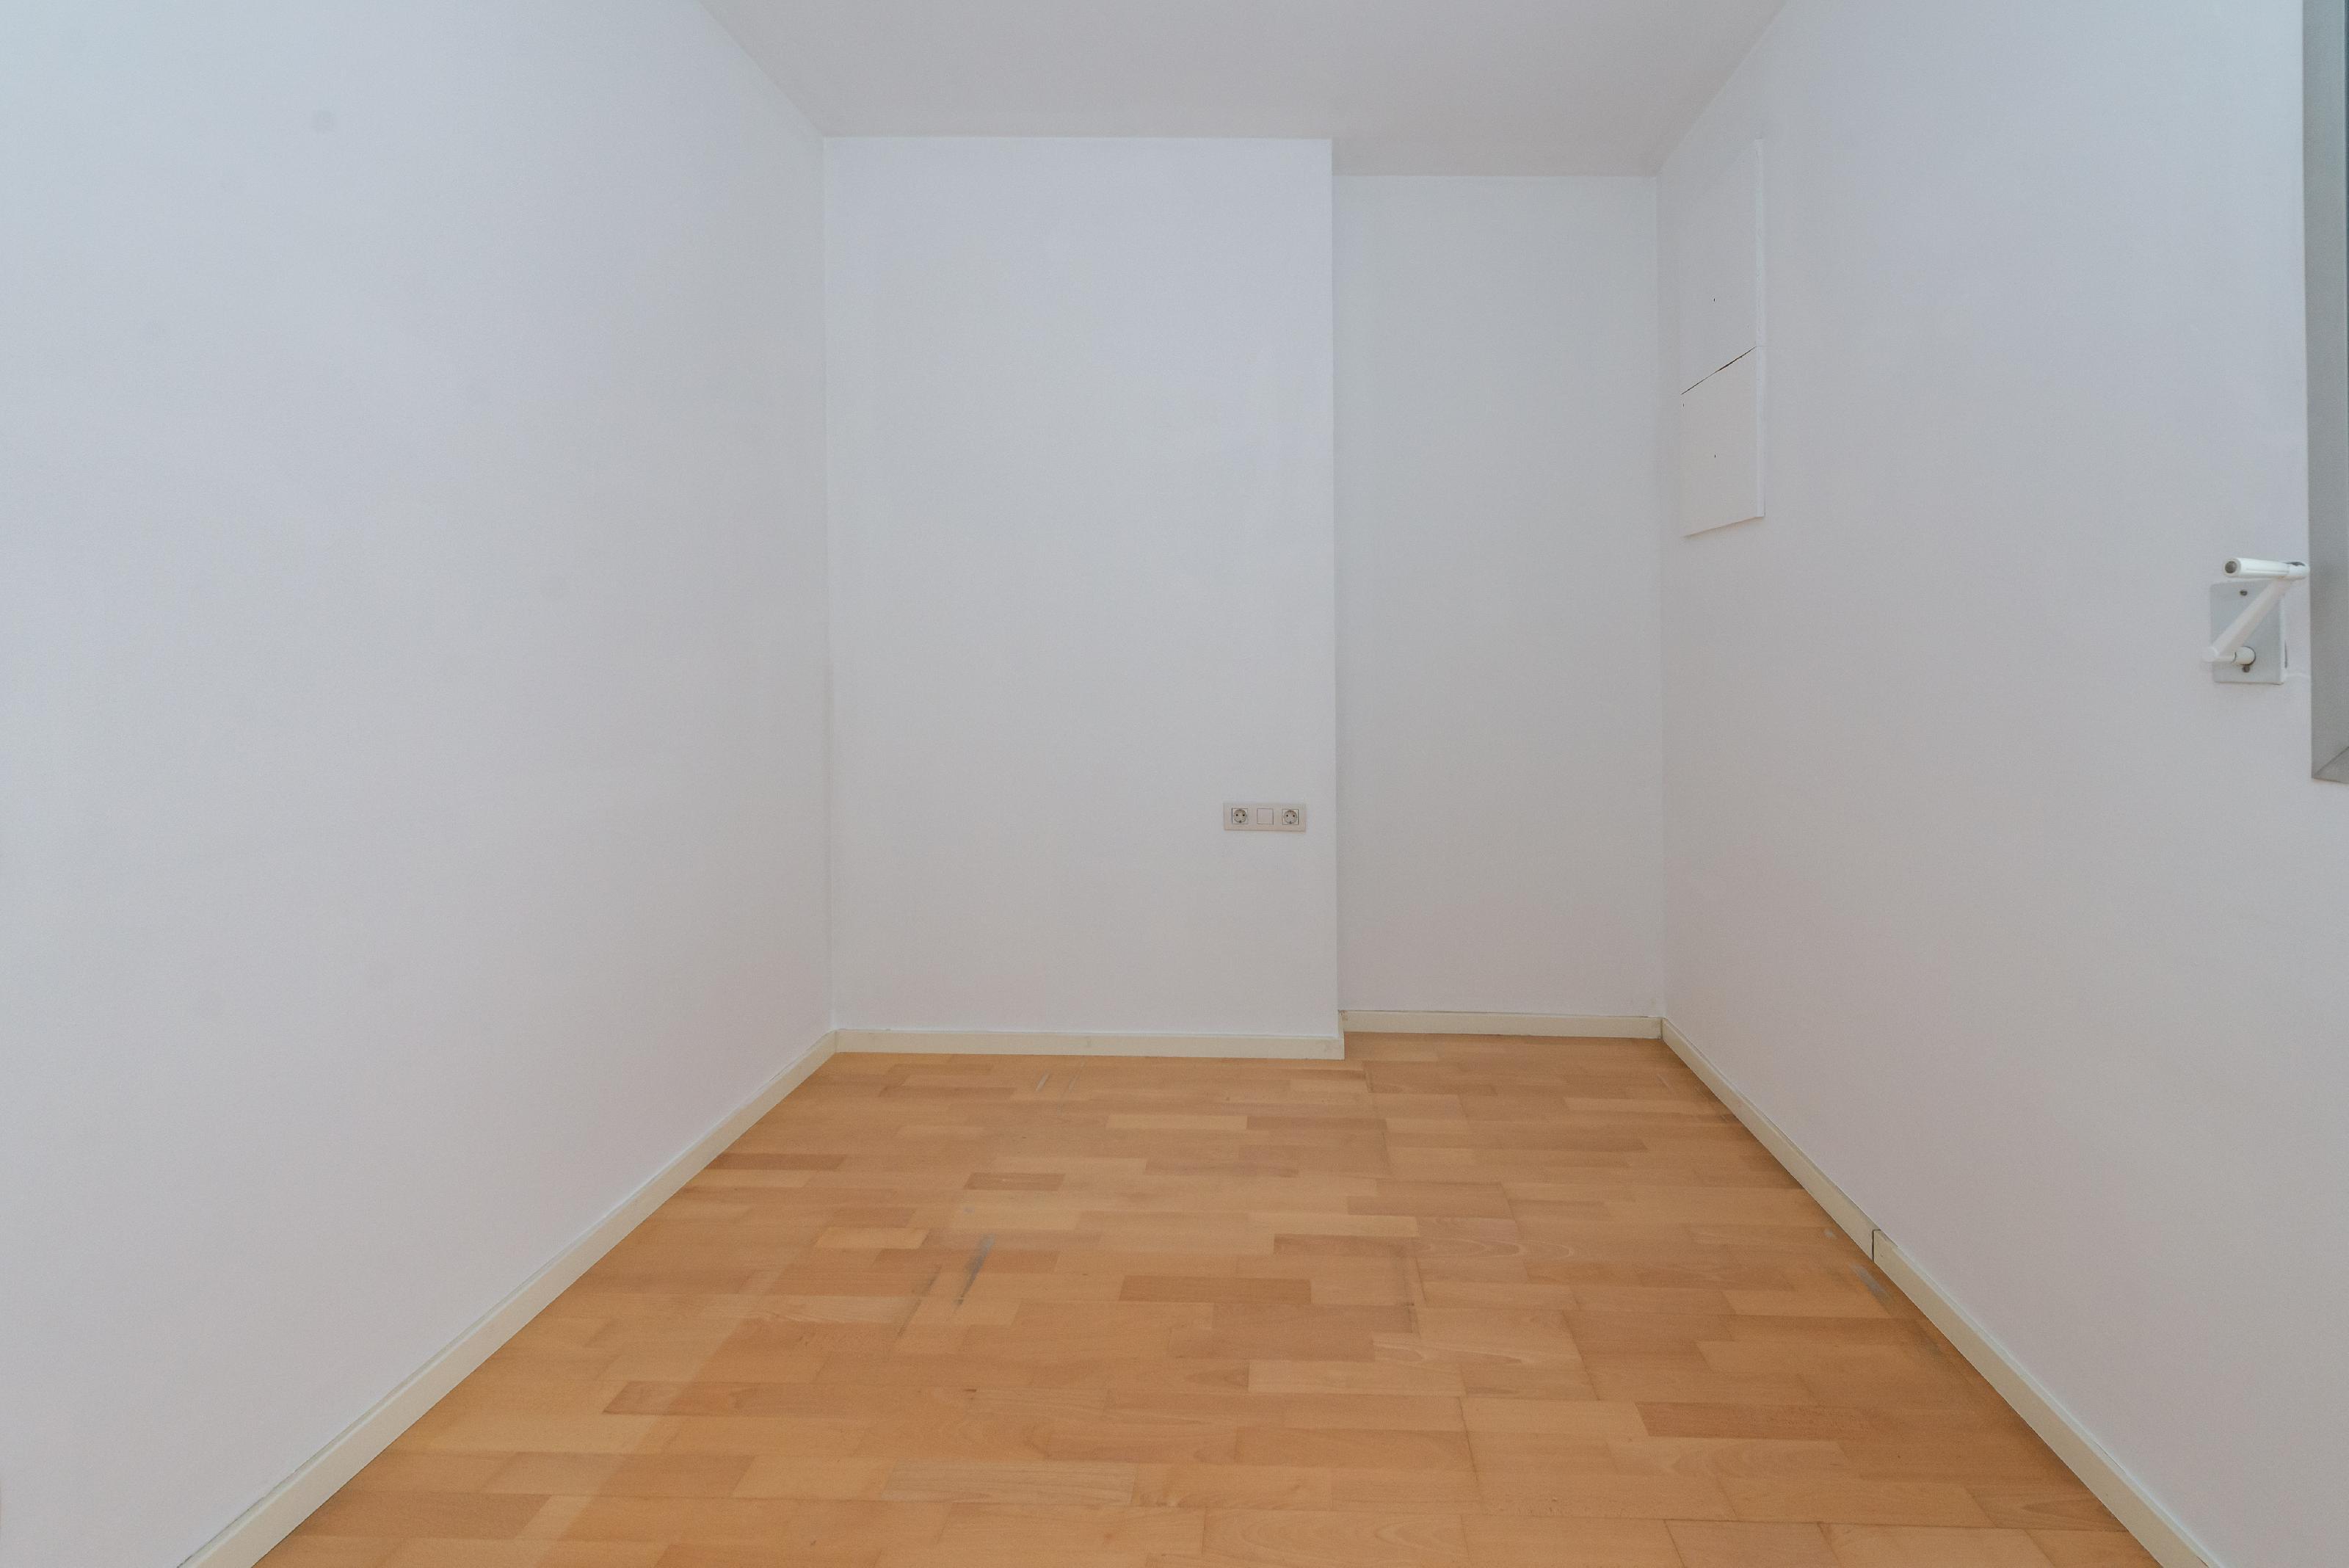 251446 Flat for sale in Sarrià-Sant Gervasi, Tres Torres 25